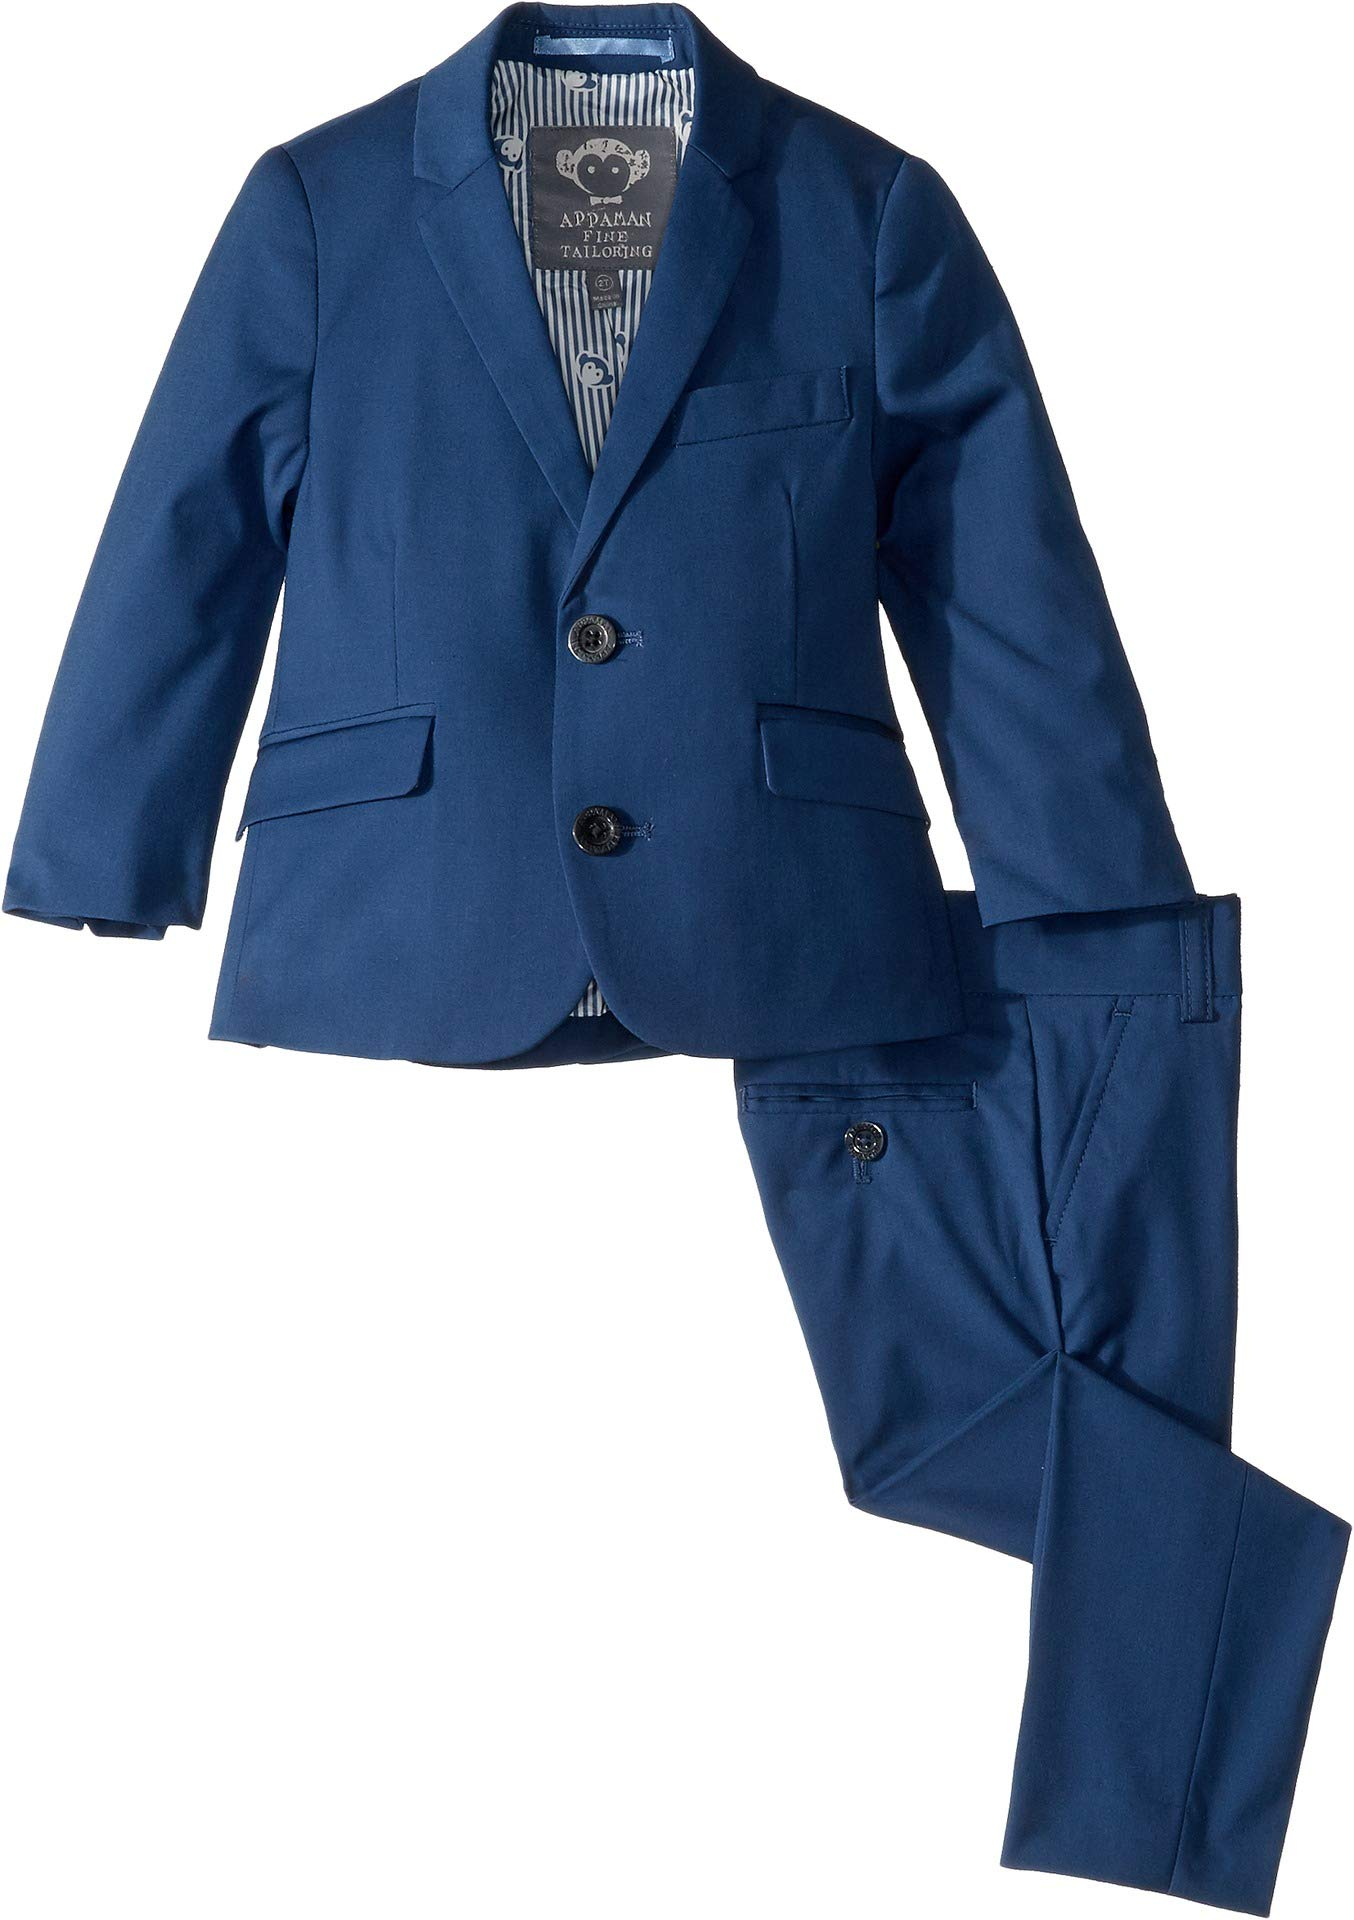 Appaman Kids Baby Boy's Mod Suit (Toddler/Little Kids/Big Kids) Insignia 10